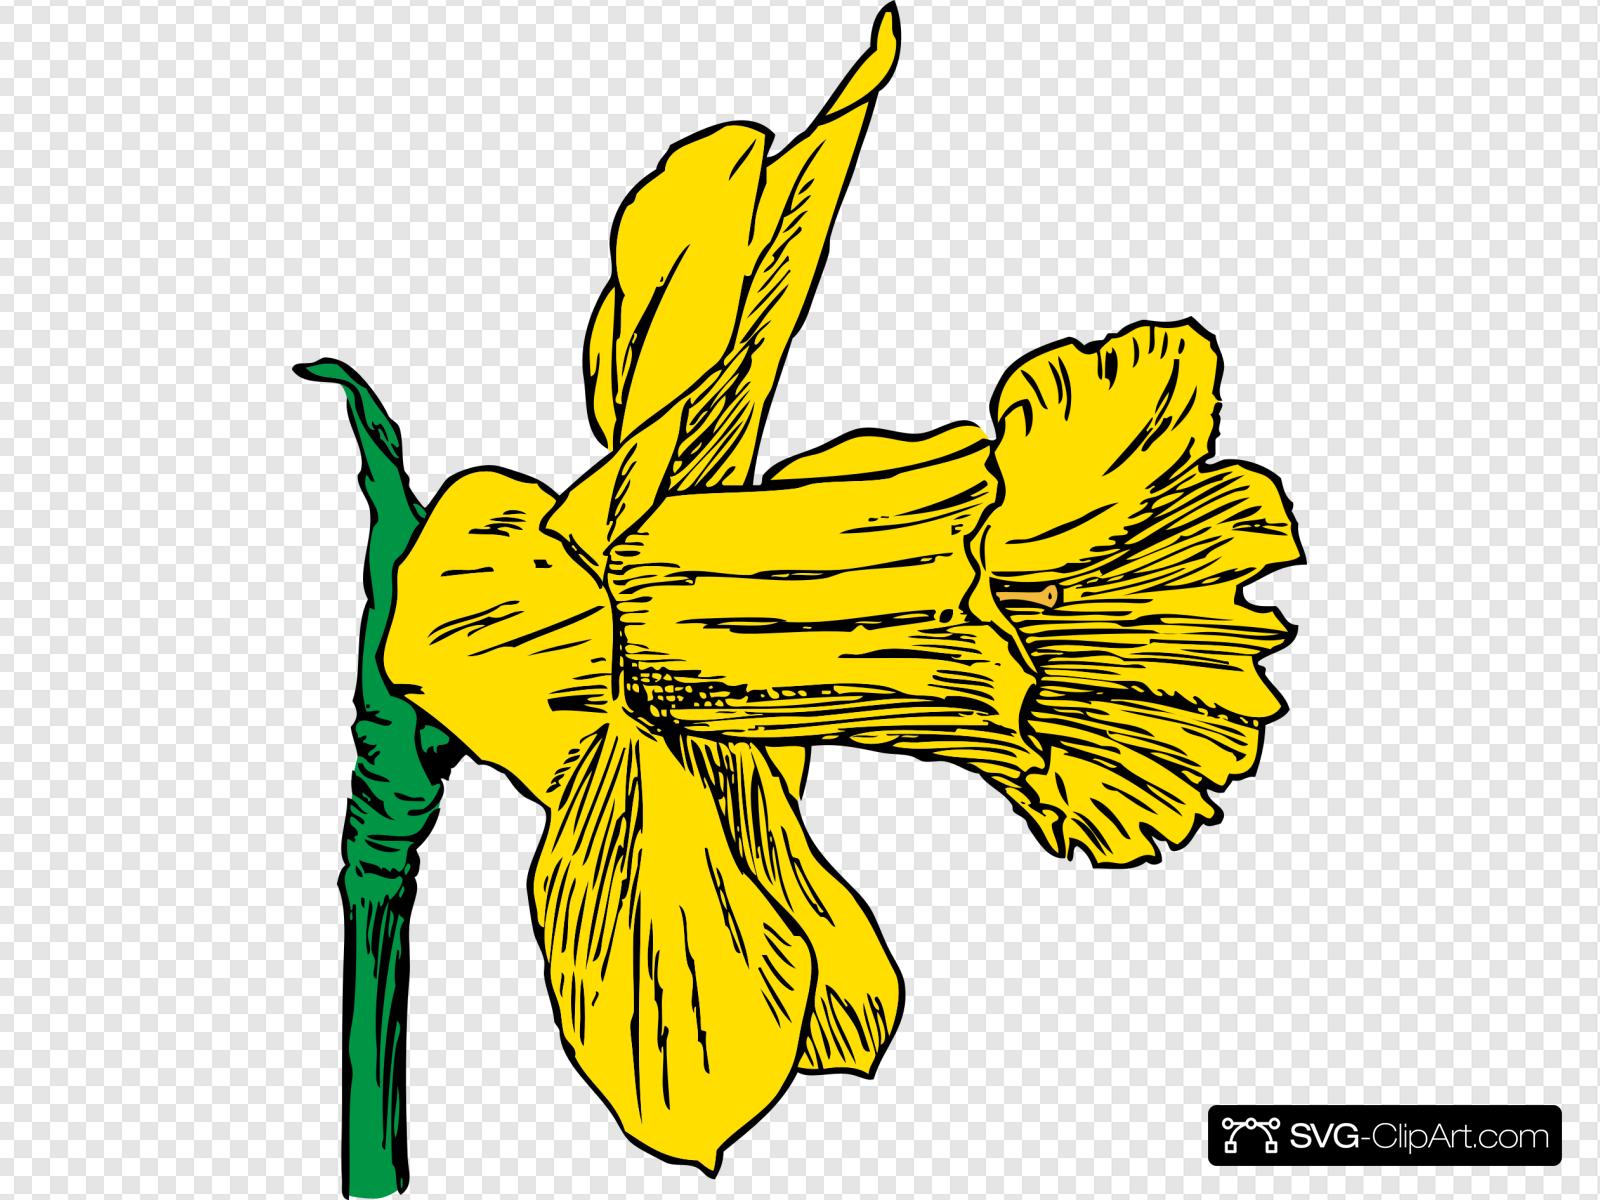 Blom clipart